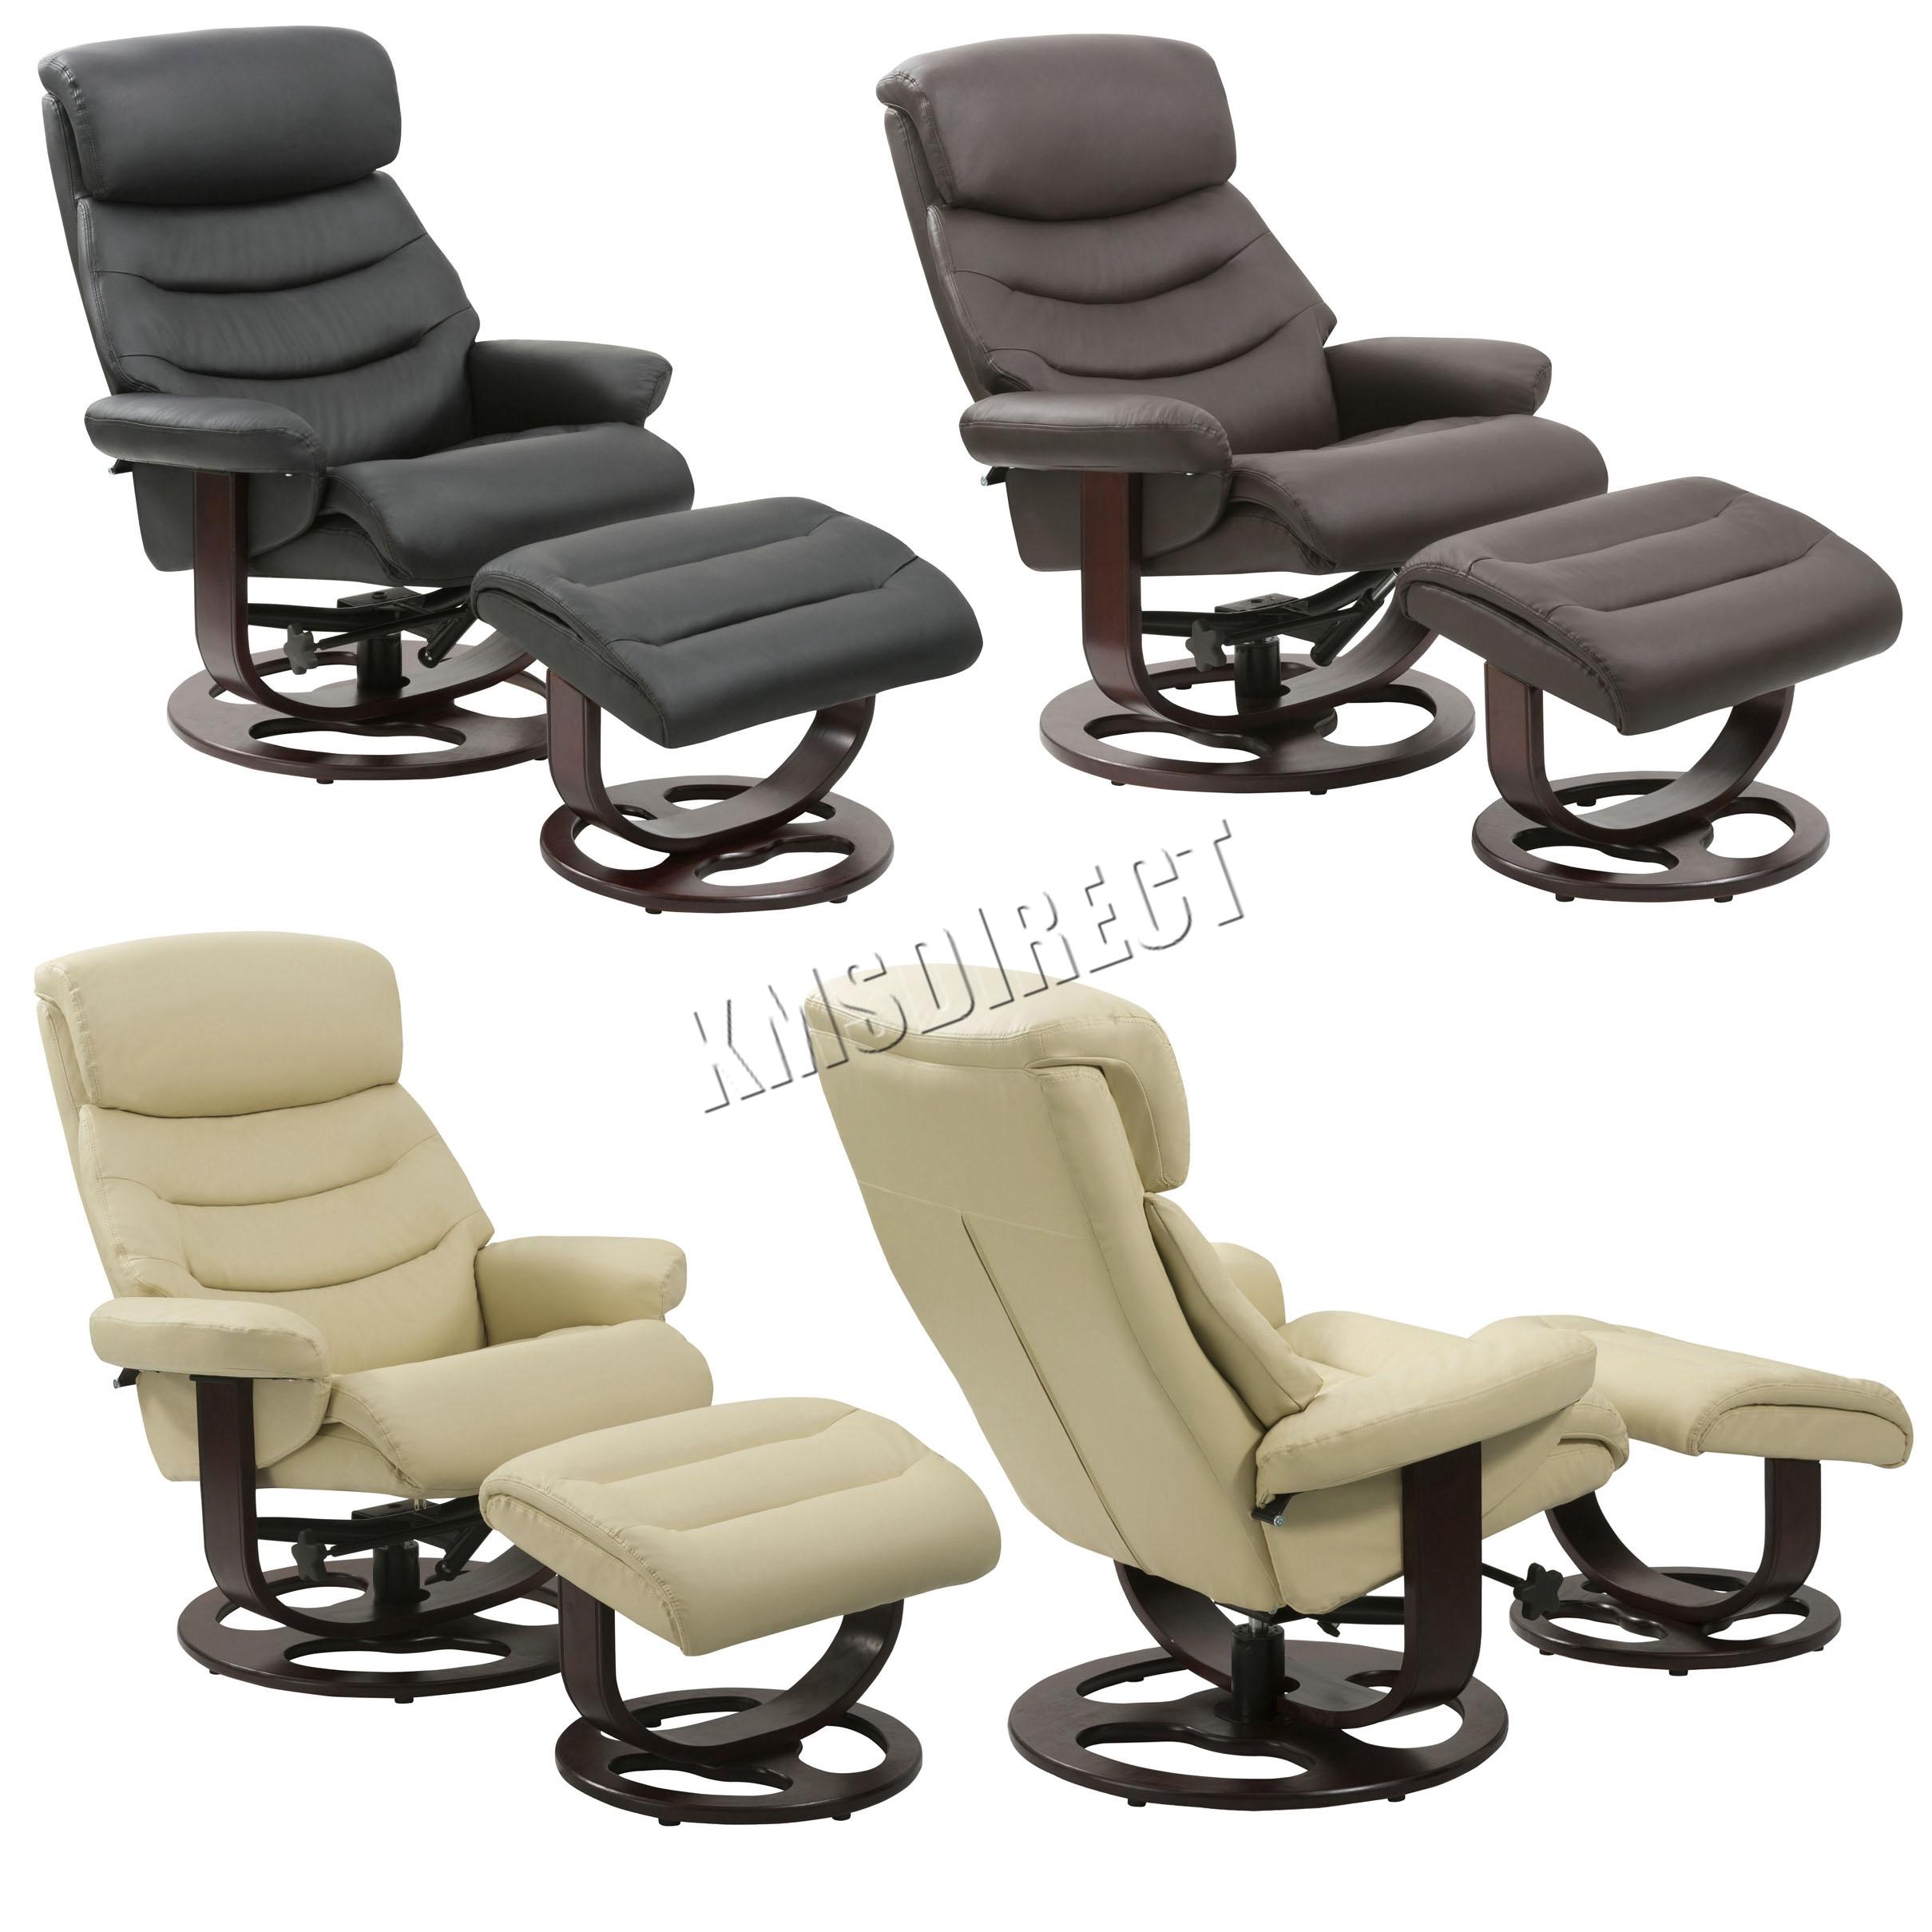 Foxhunter Executive Recliner Pu Arm Chair Swivel Lounger Seat Foot Stool Rcs04 Ebay